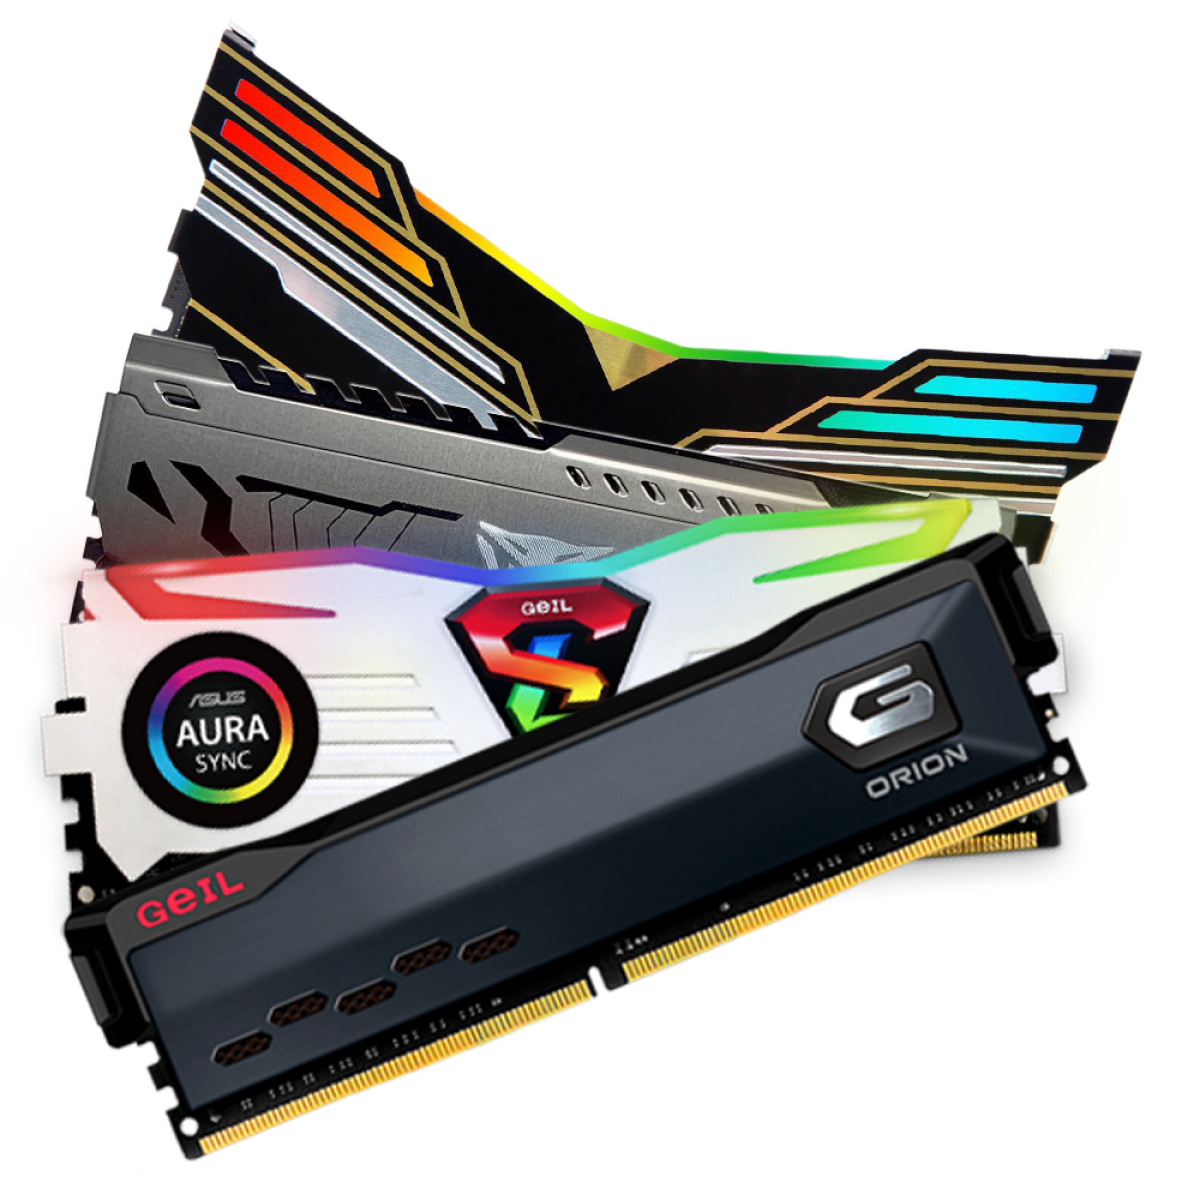 Kit Upgrade, AMD Ryzen 5 PRO 4650G + Asus Prime B450M Gaming/BR +  8GB DDR4 3000MHz